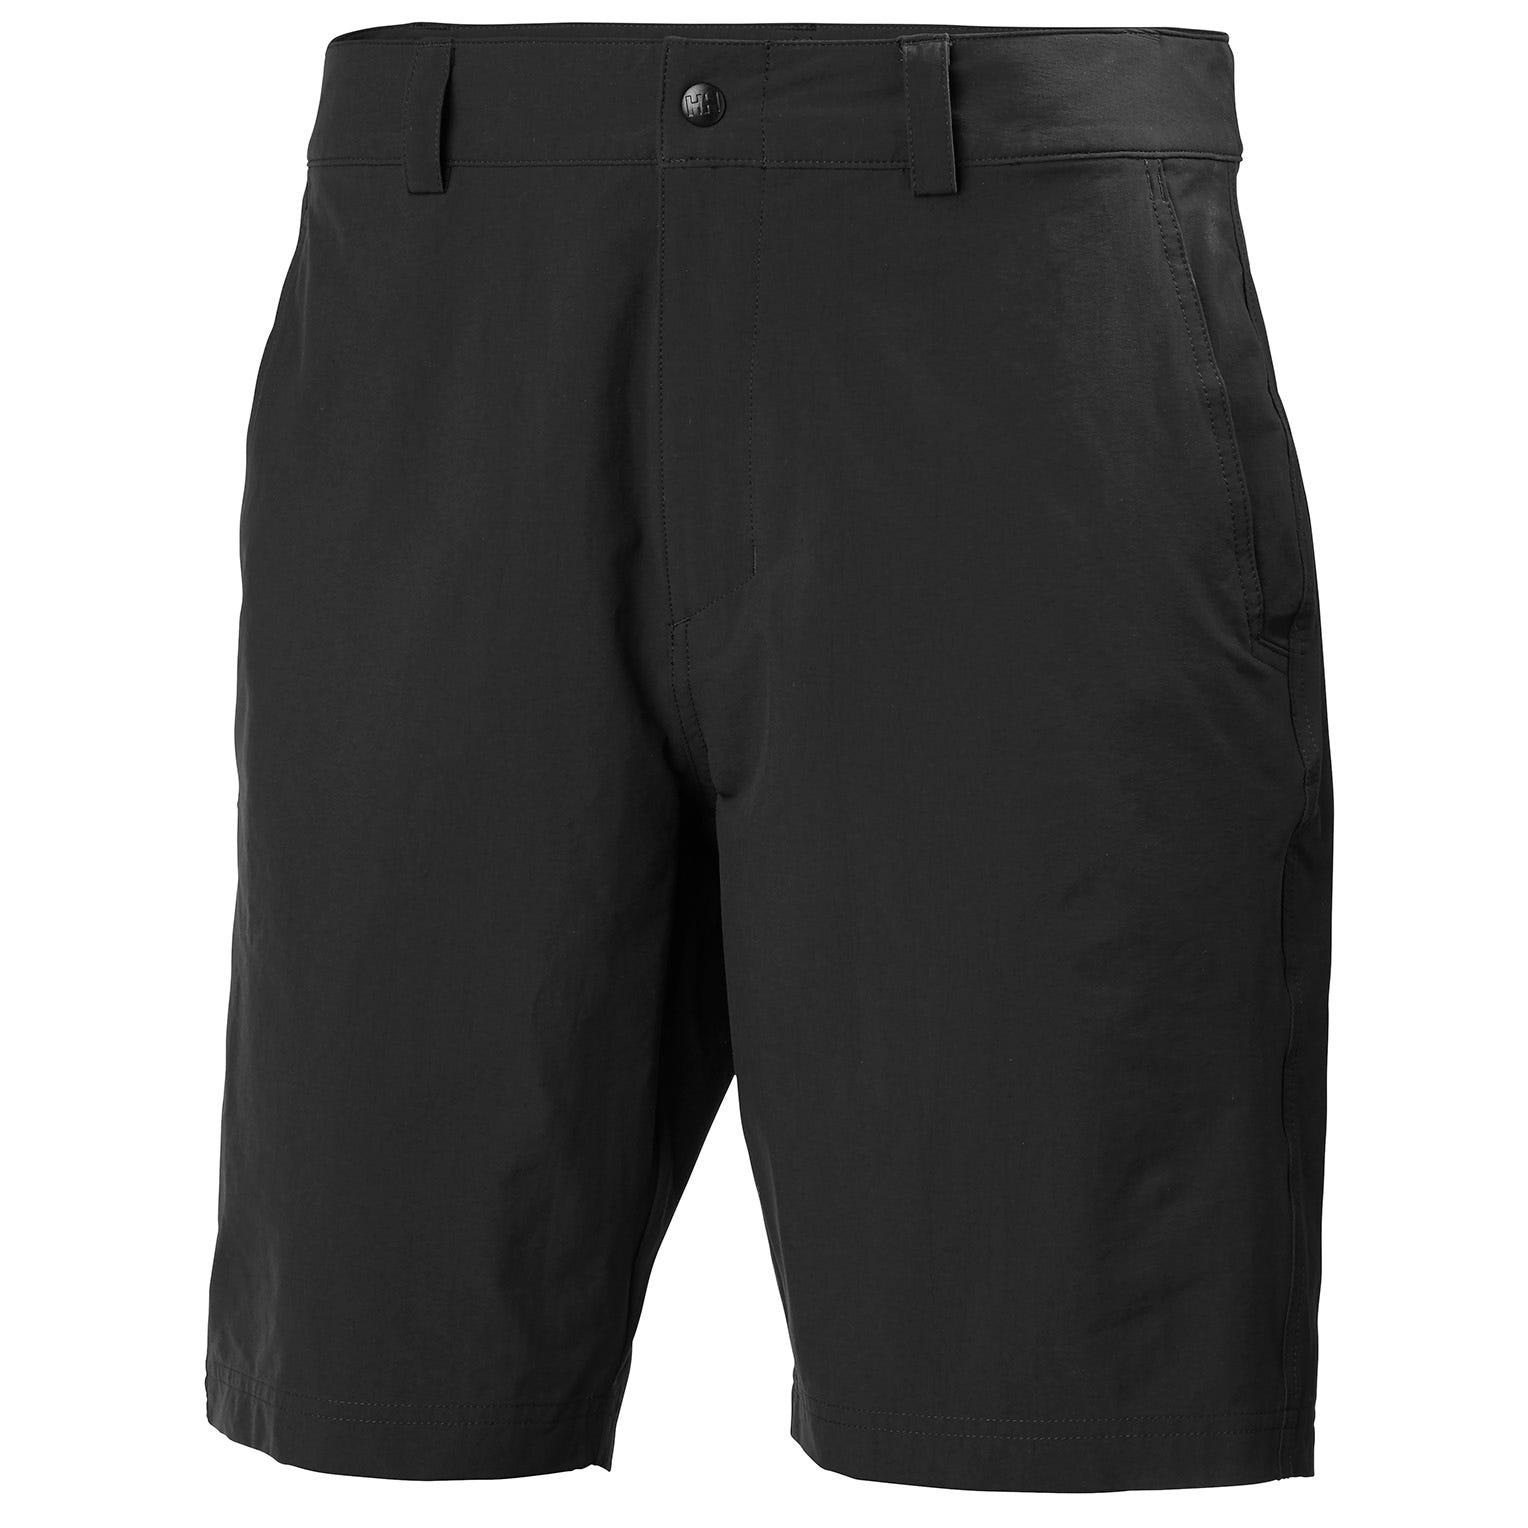 "Helly Hansen Hp Qd Club Shorts 10"" Mens Sailing Pant Black 28"